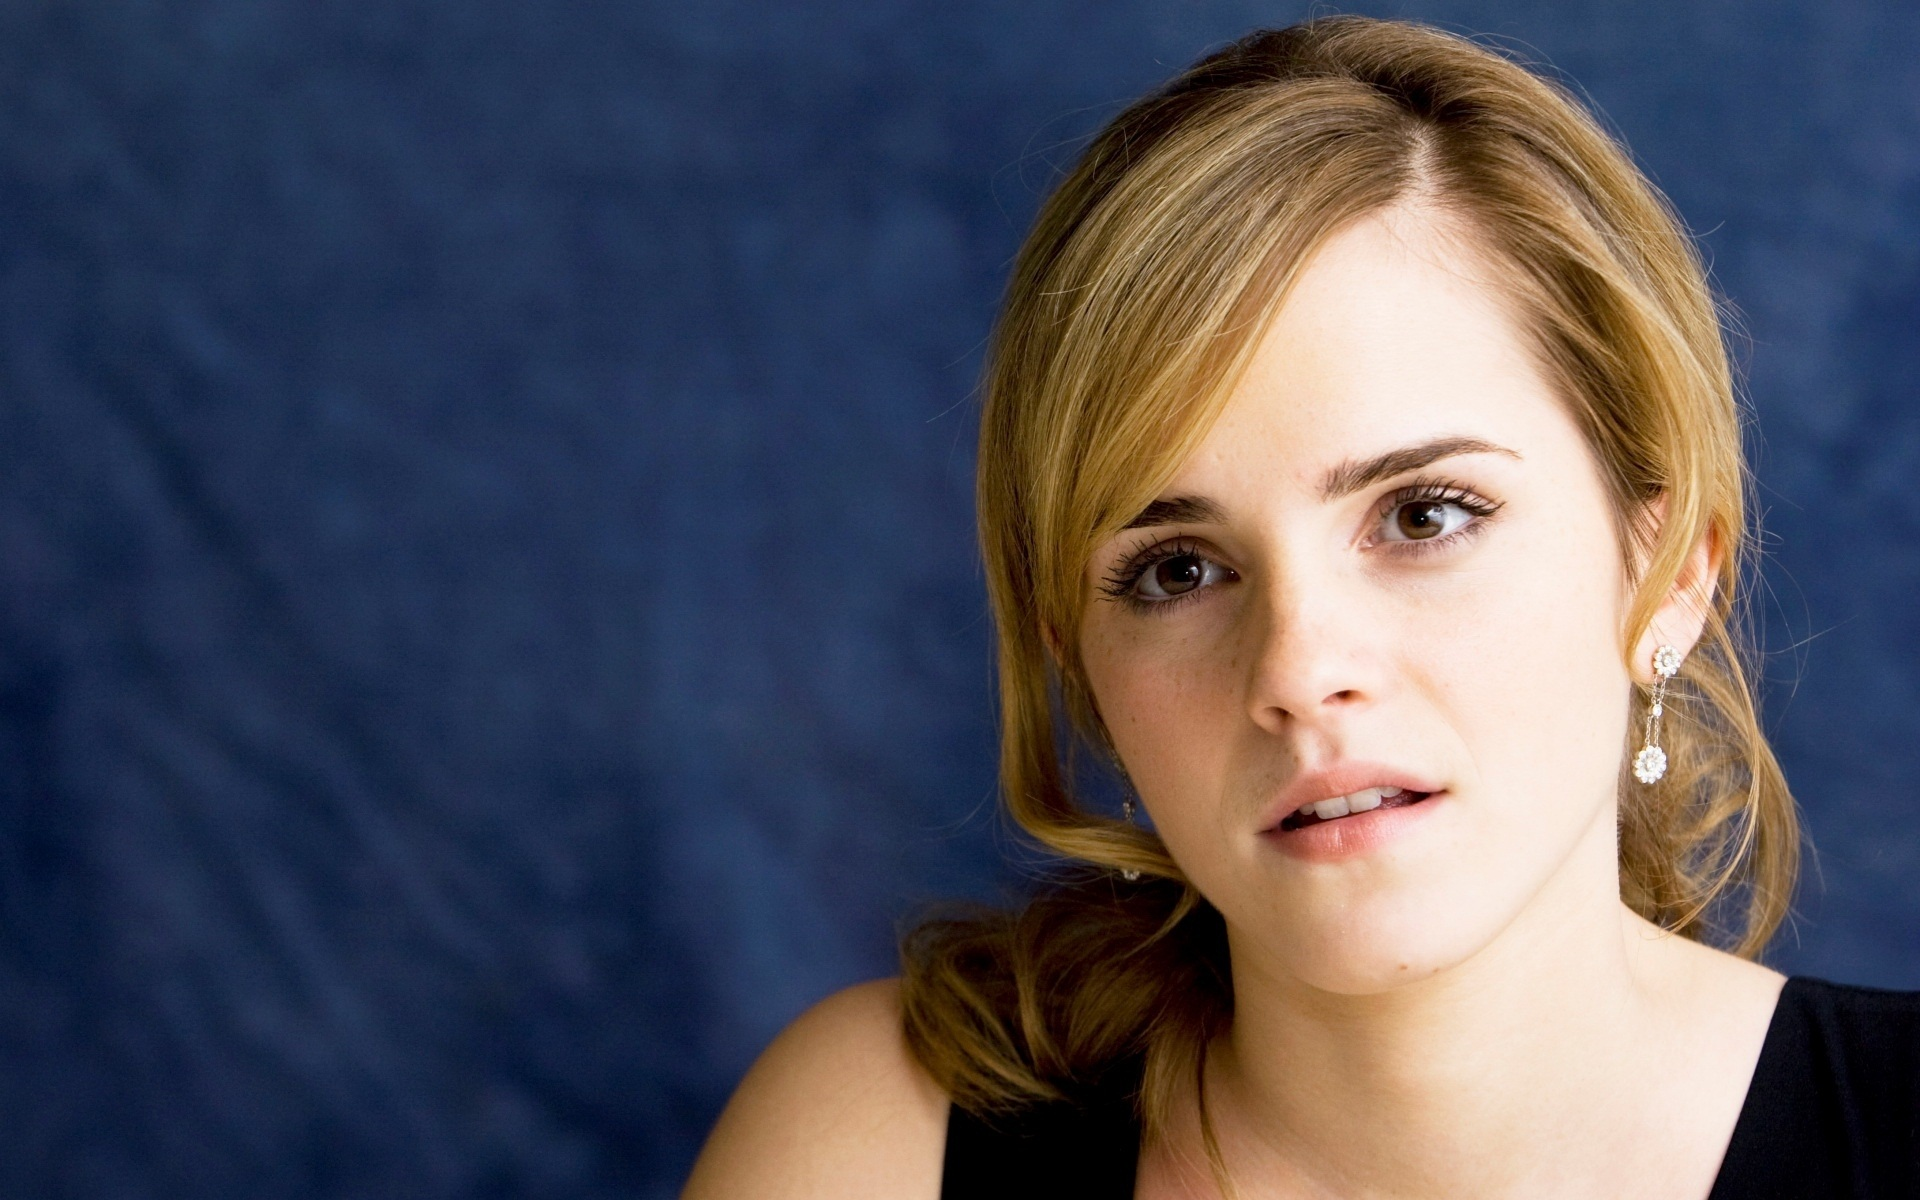 Emma Watson Wallpaper Hd - WallpaperSafari